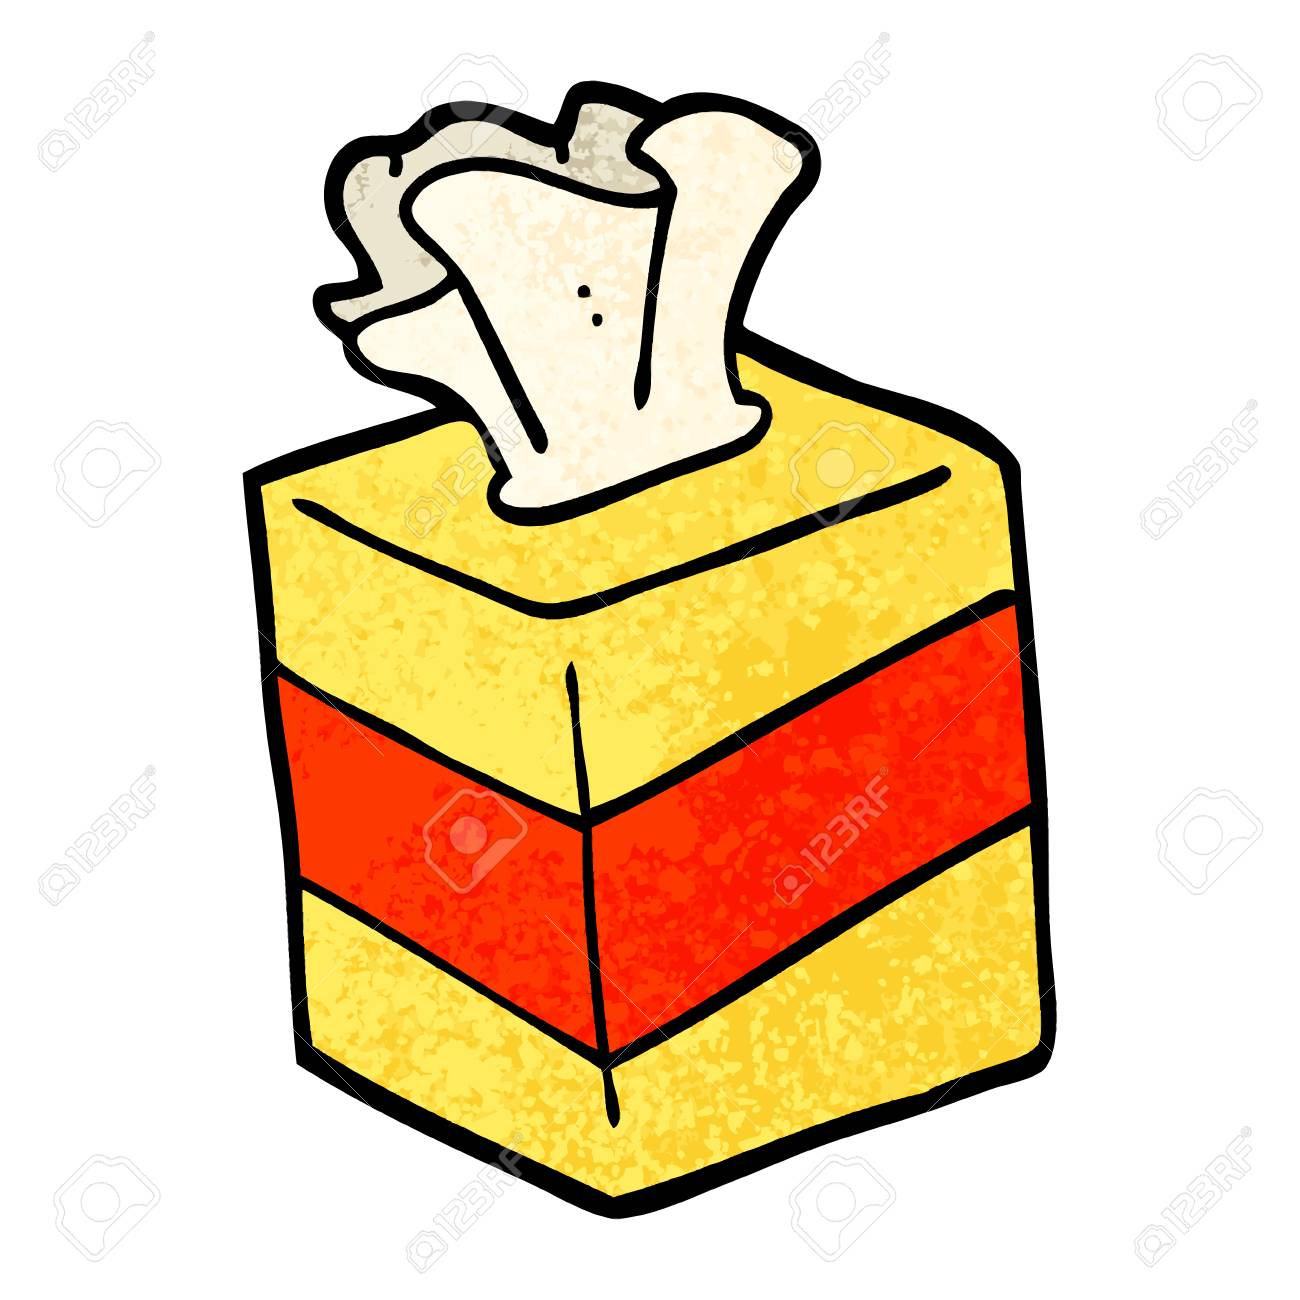 Image result for tissue cartoon